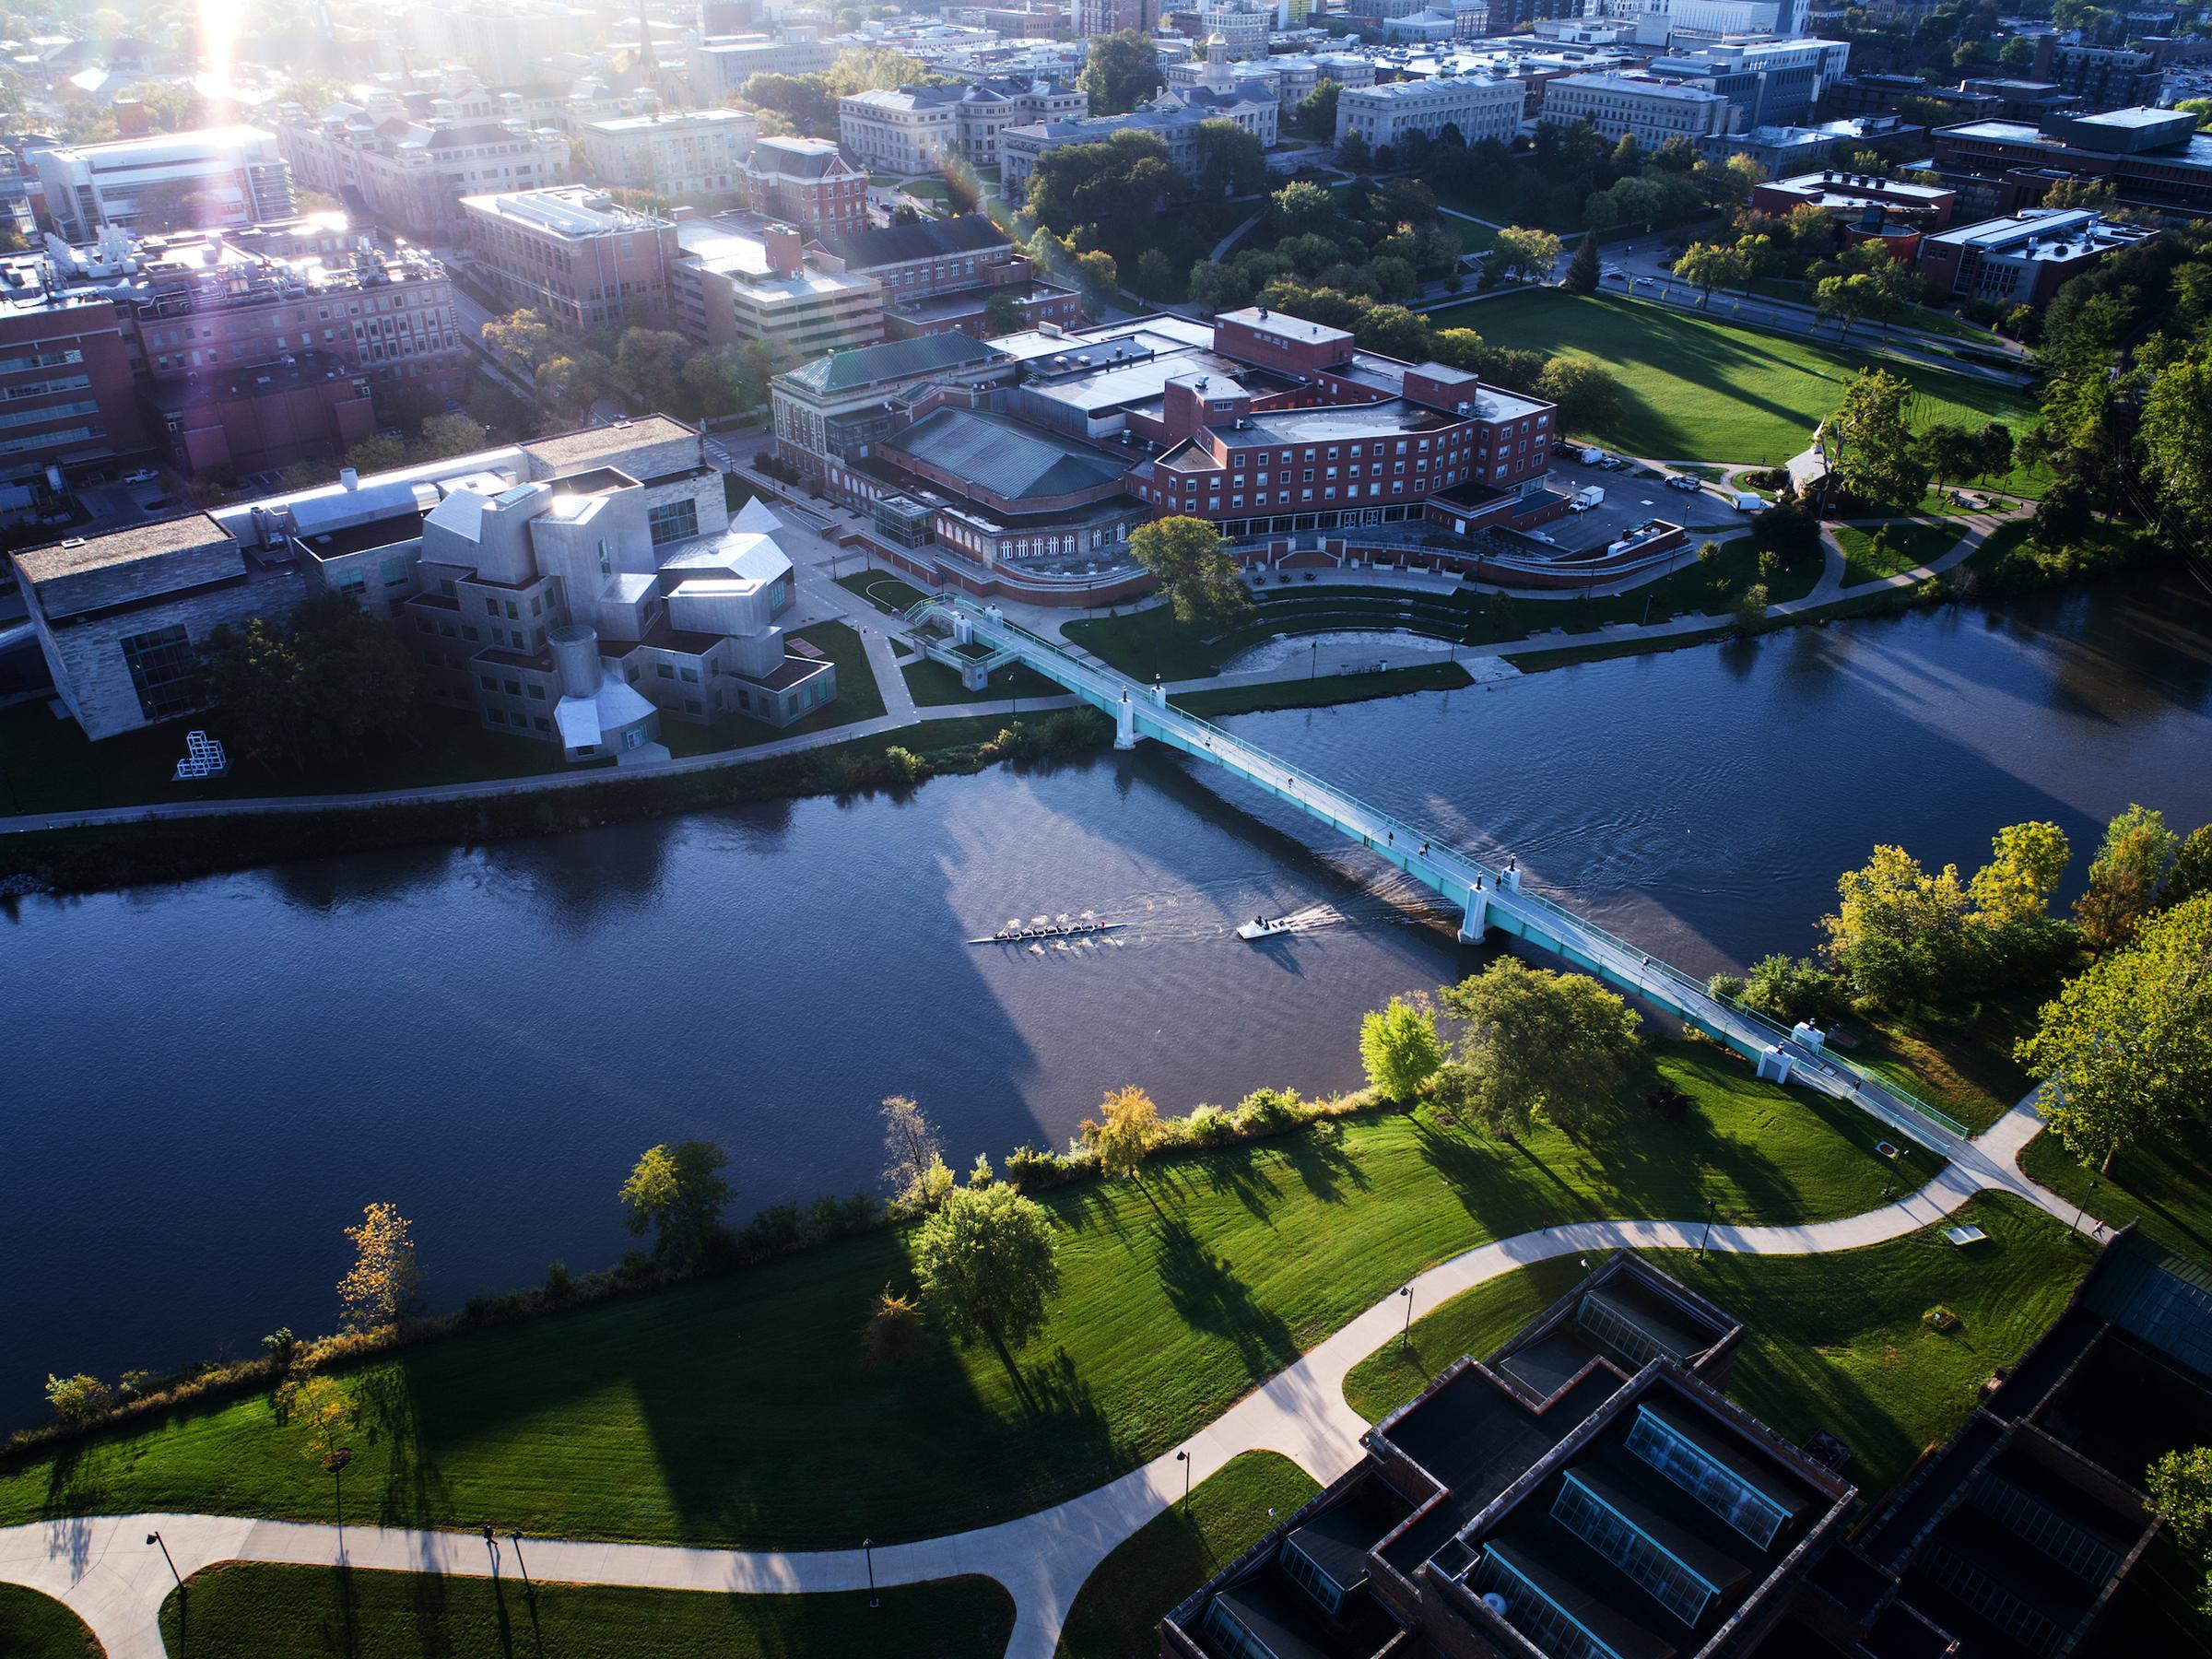 Aerial view of University of Iowa campus